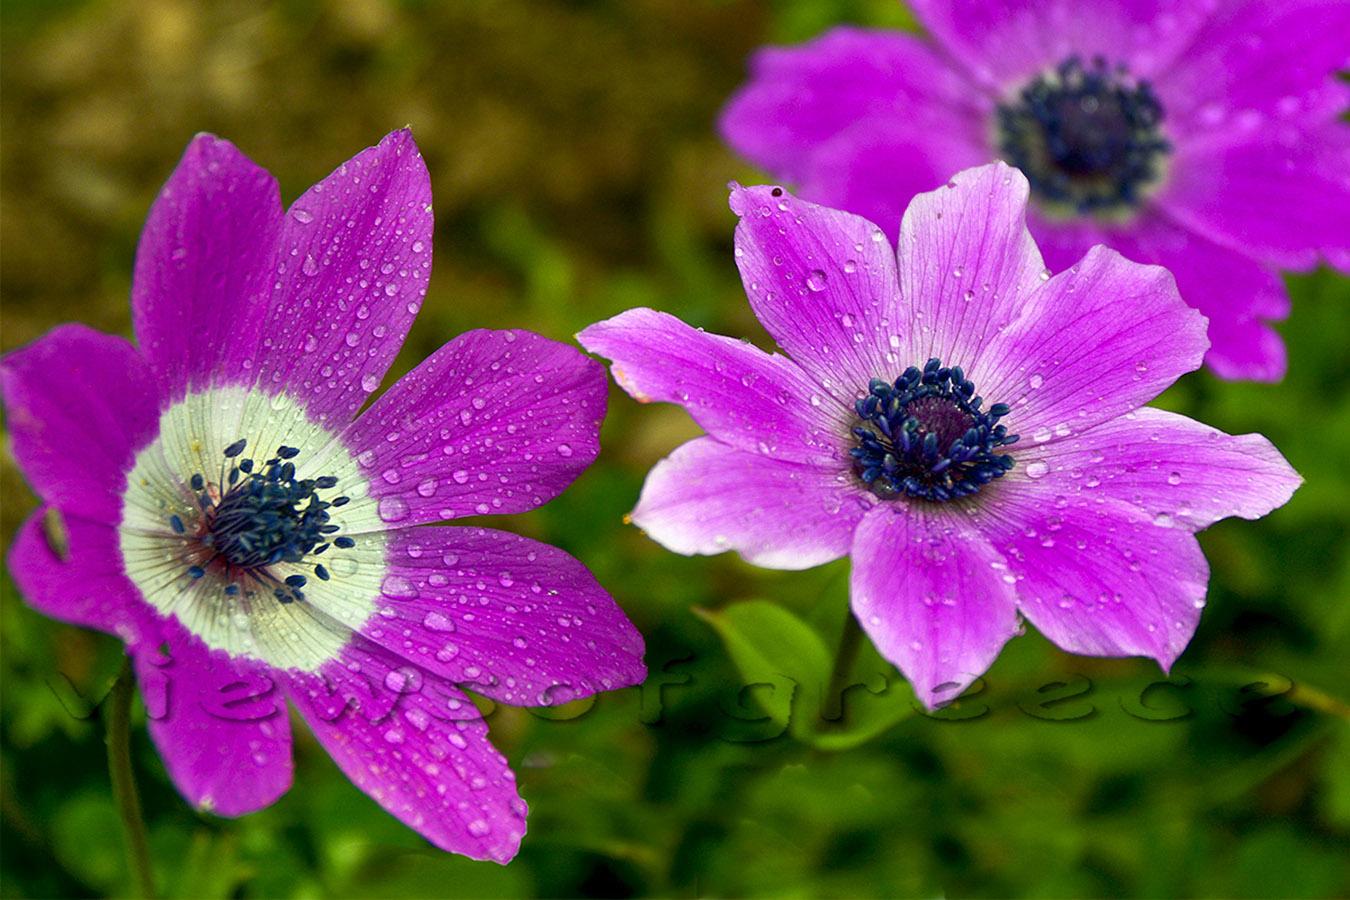 Anemone kori tou anemou